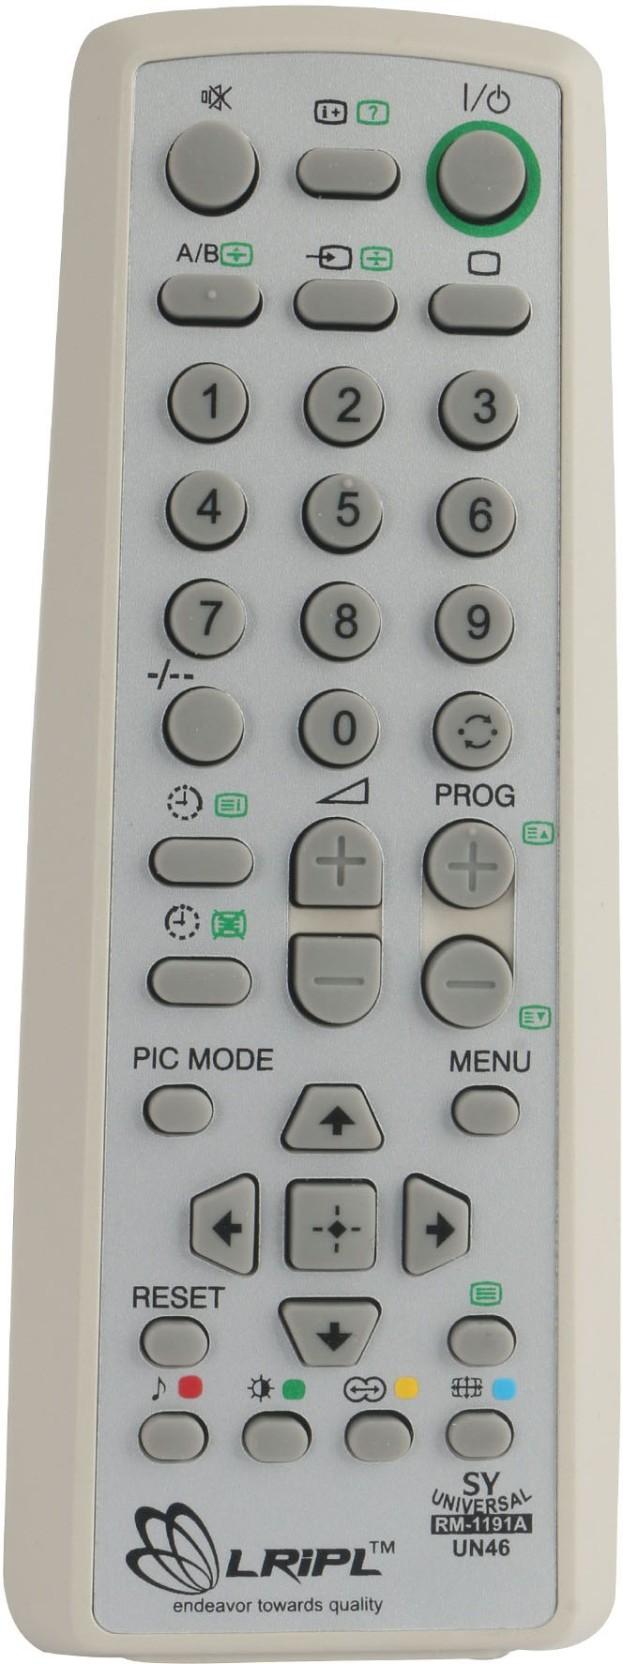 Lripl Universal REMOTE Compatible for Sony TV Remote Controller